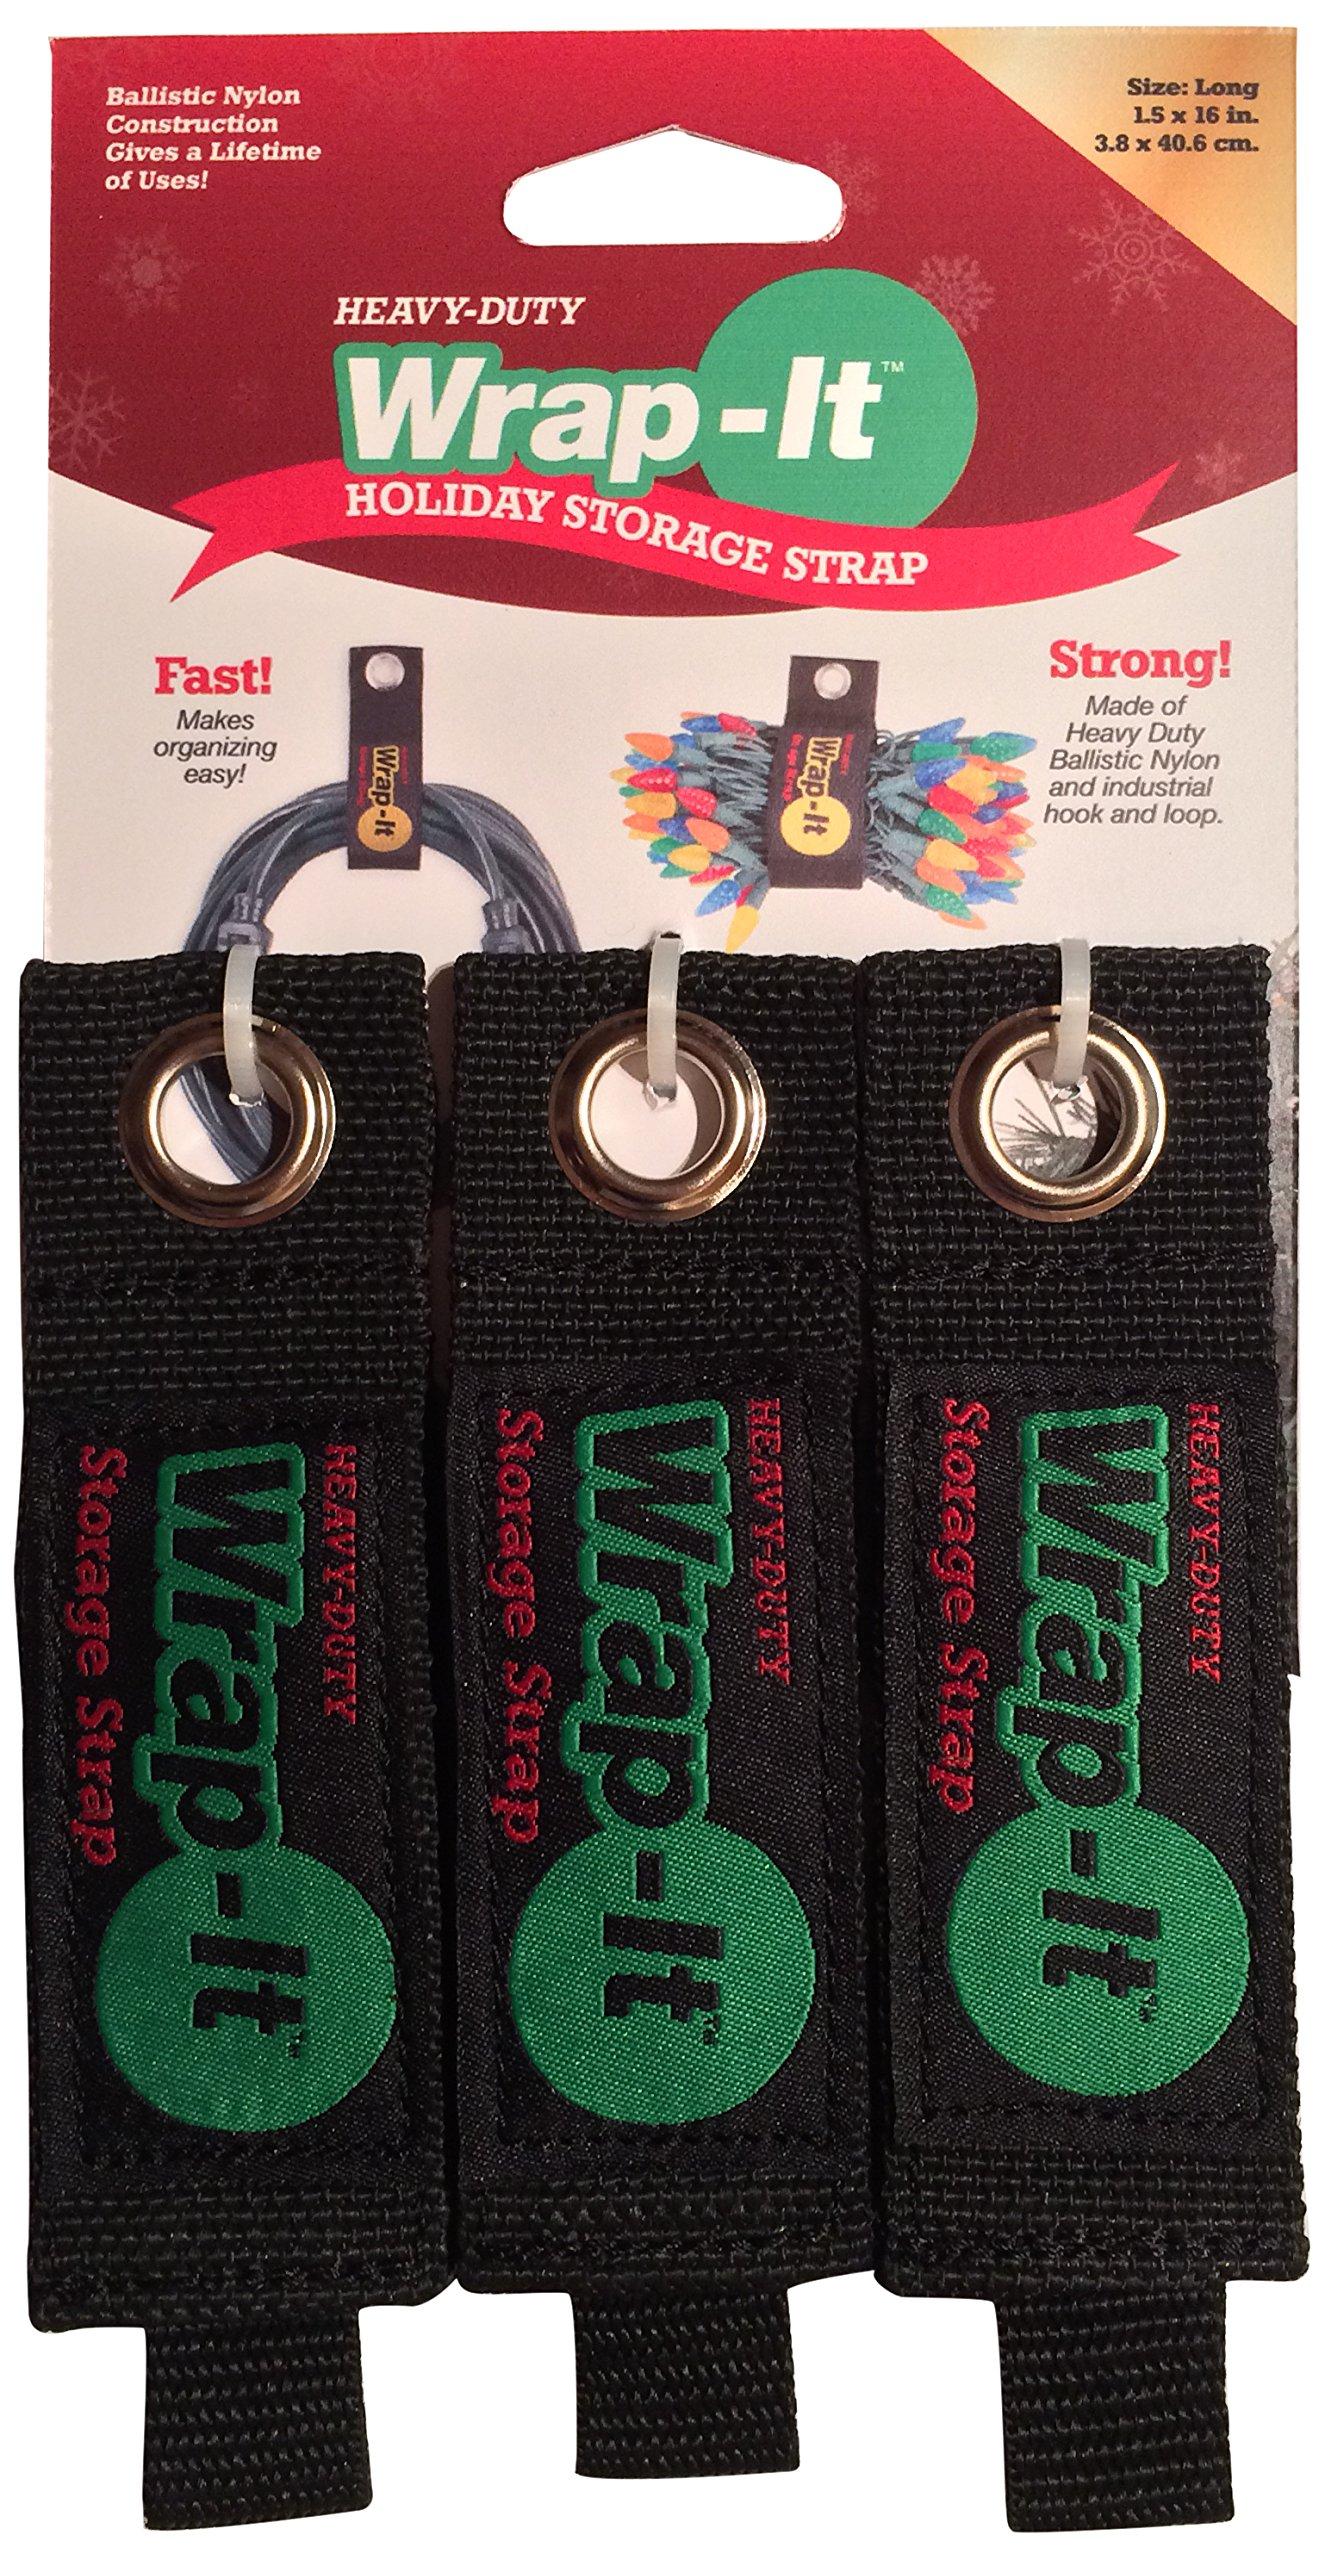 Wrap-It Storage Straps 203-20B Straps, Regular, Black